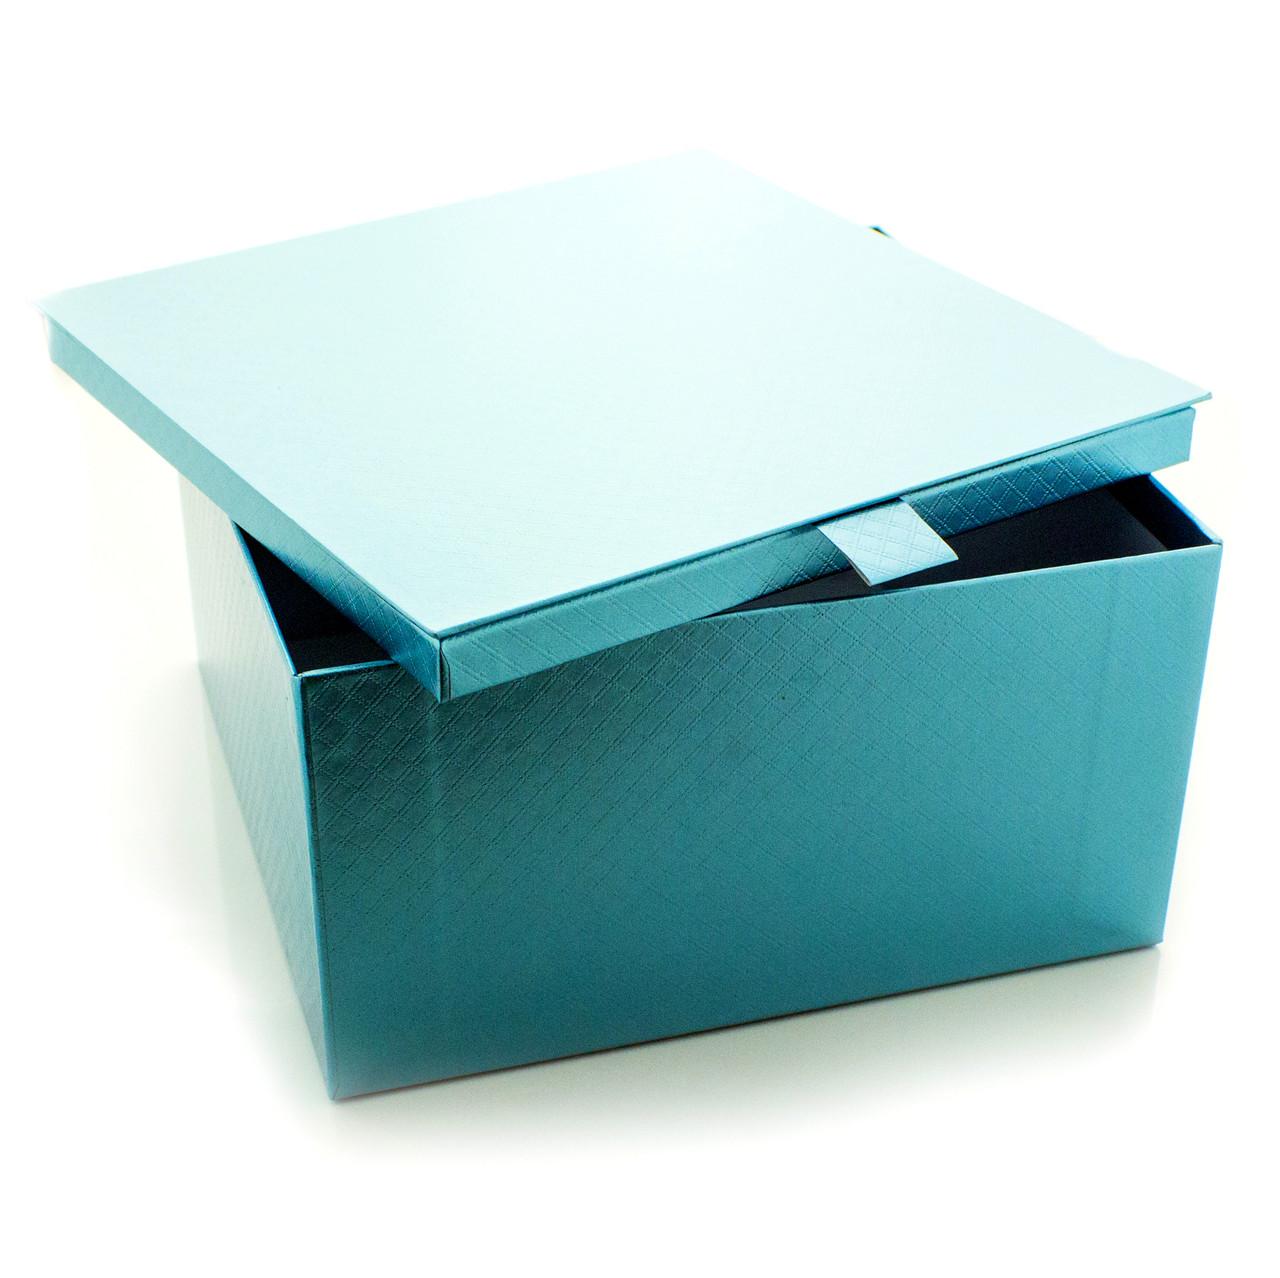 Подарочная коробка Голубой Металлик 22 x 22 x 12 см